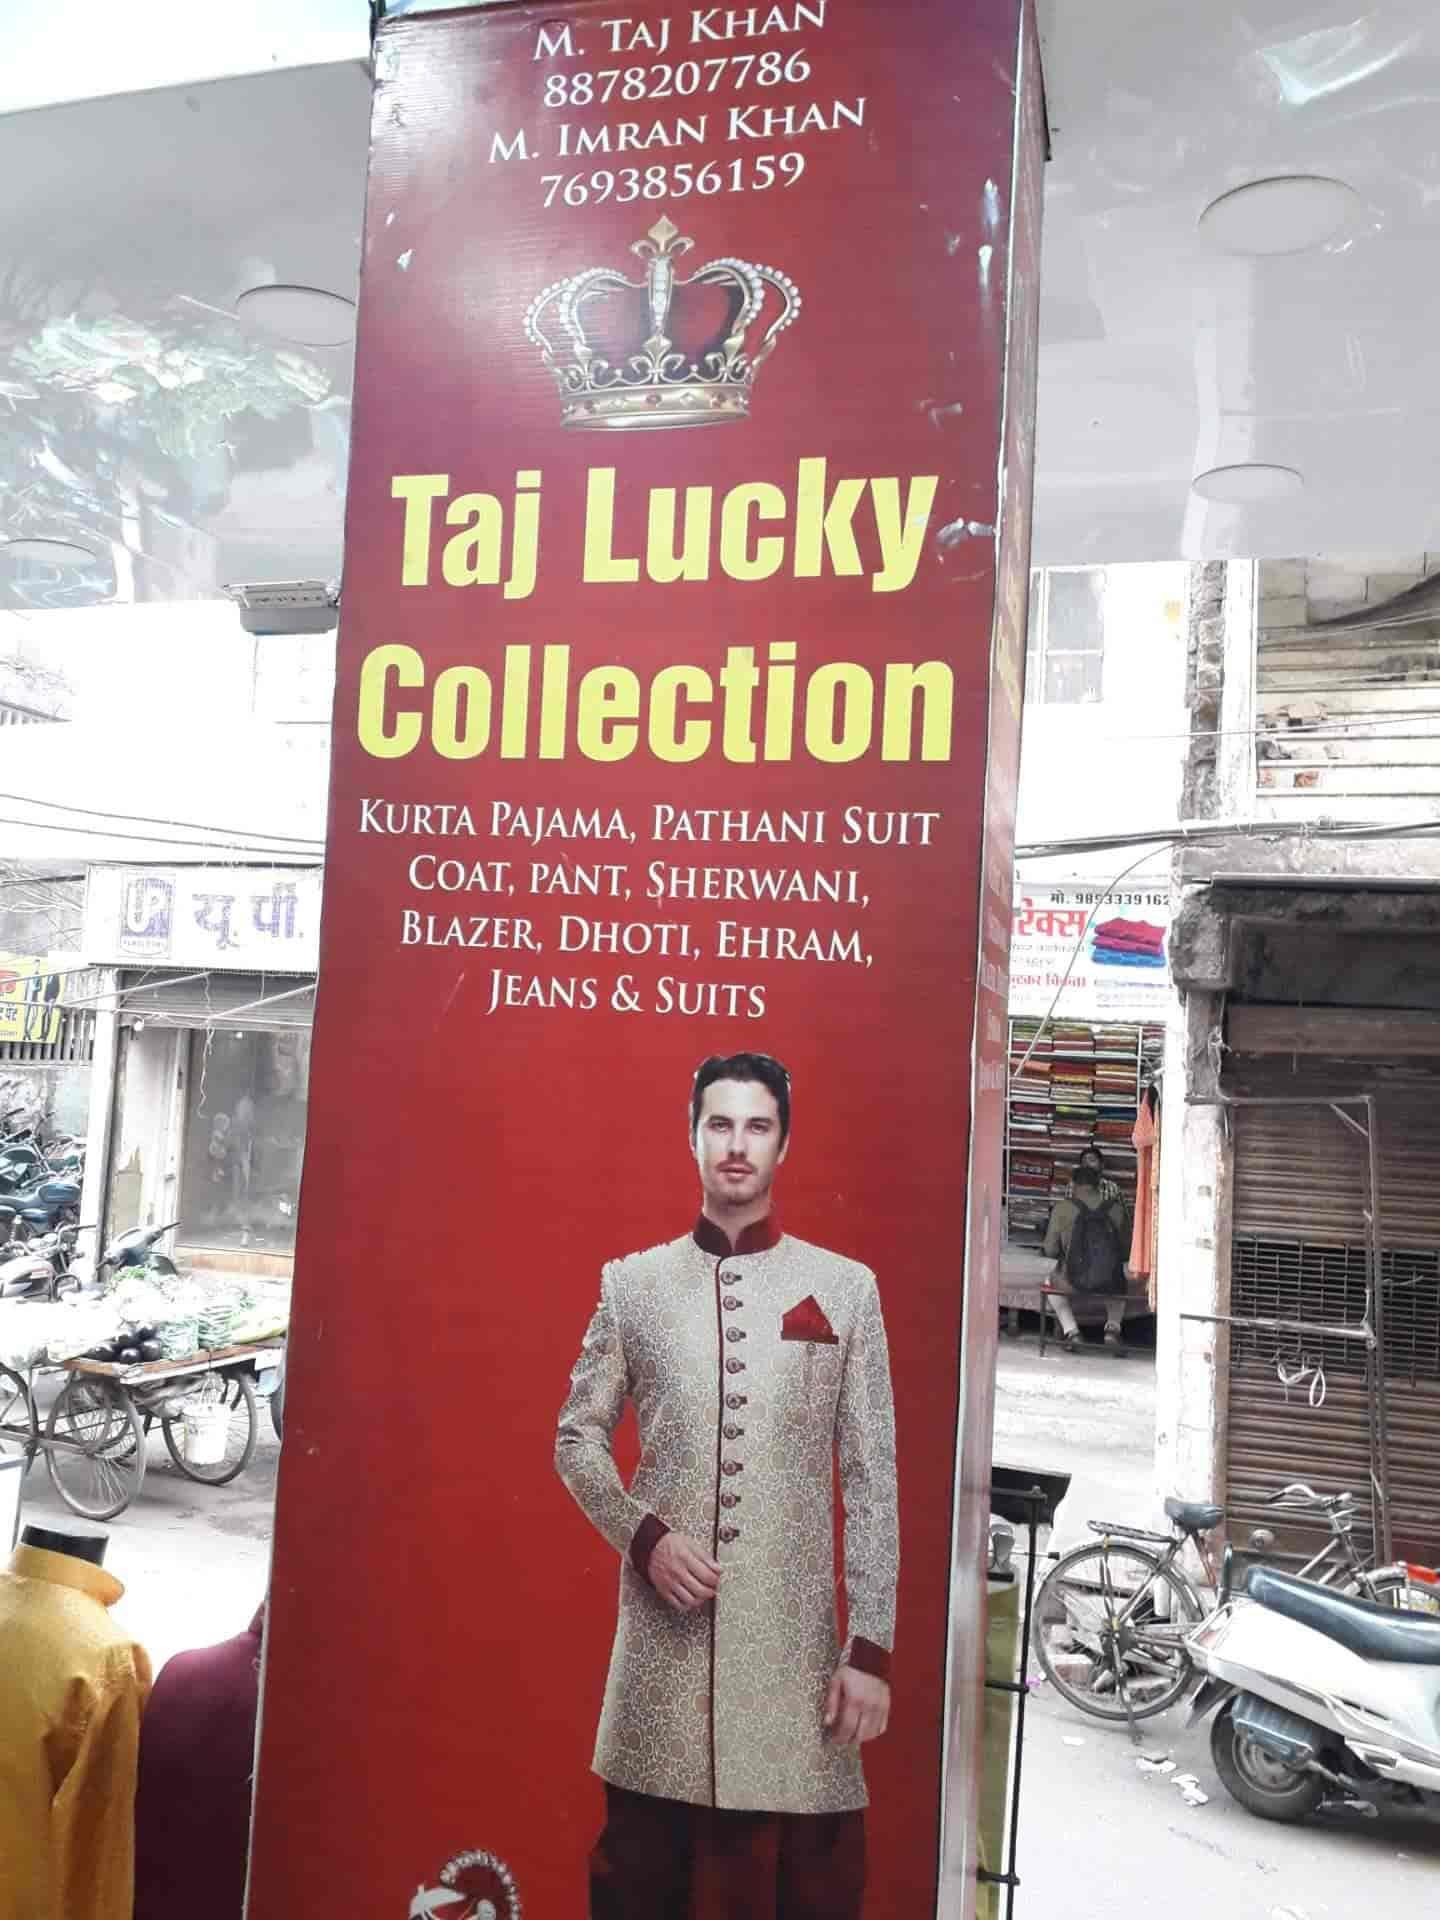 Taj Lucky Collection, Ibrahimpura - Readymade Garment